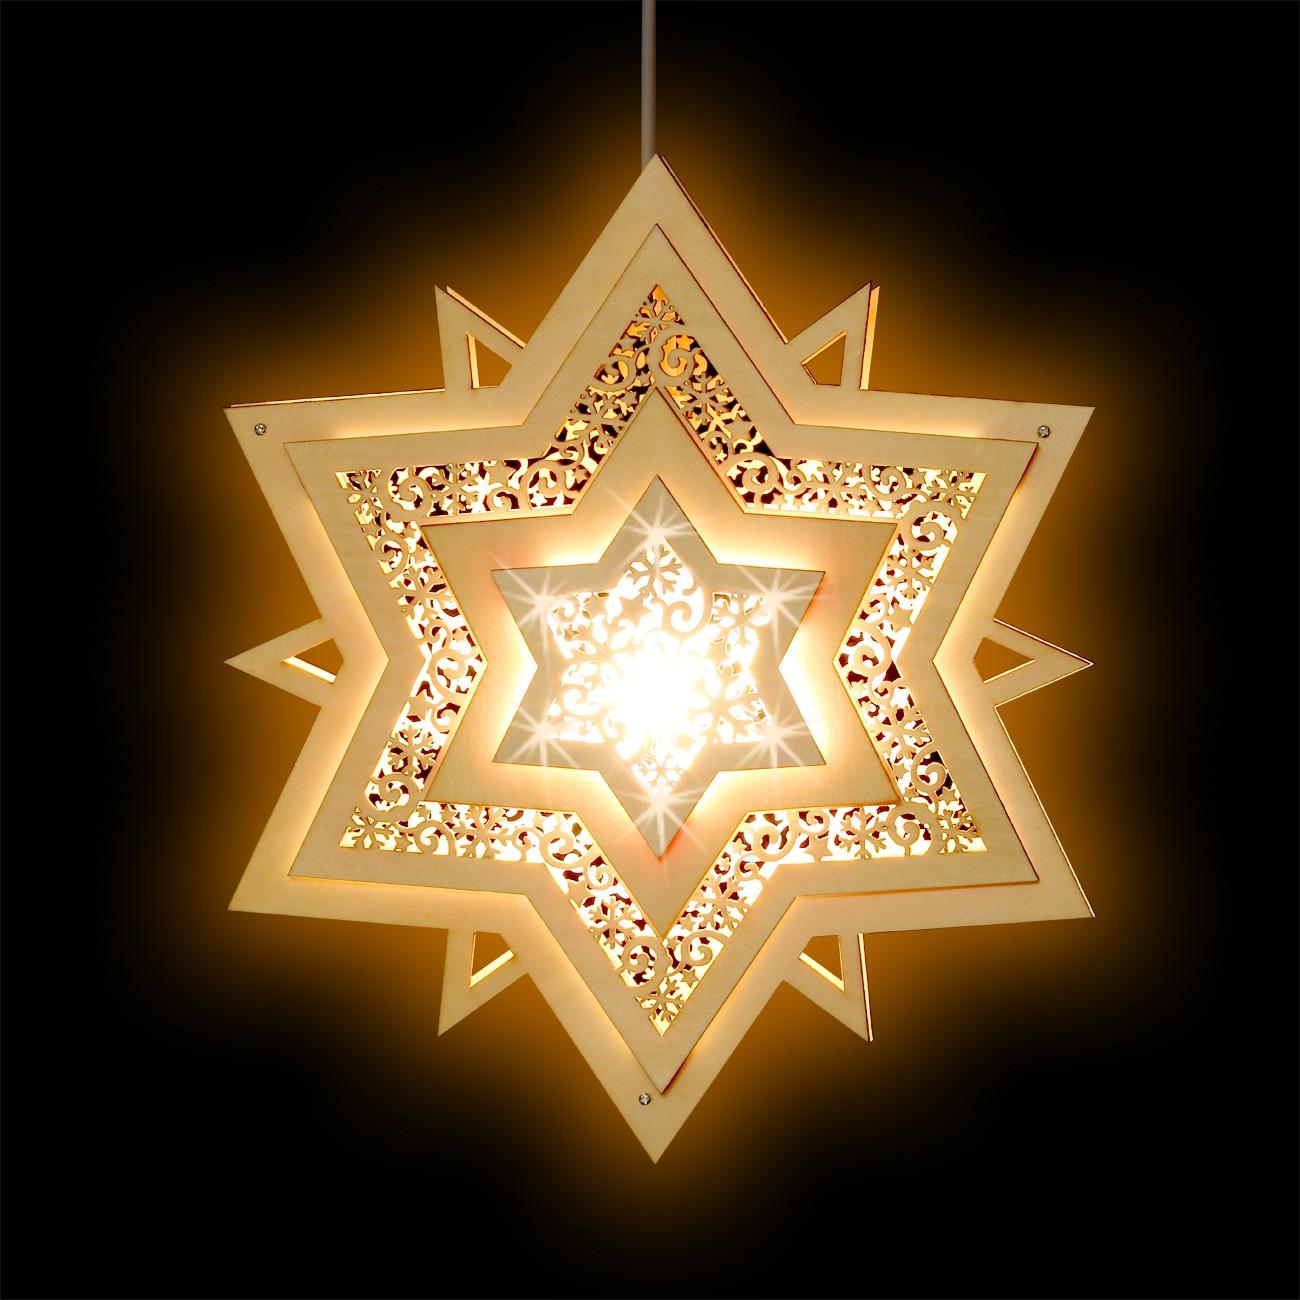 sikora fb31 beleuchtetes holz fensterbild motiv stern mit ornamenten fensterbilder. Black Bedroom Furniture Sets. Home Design Ideas